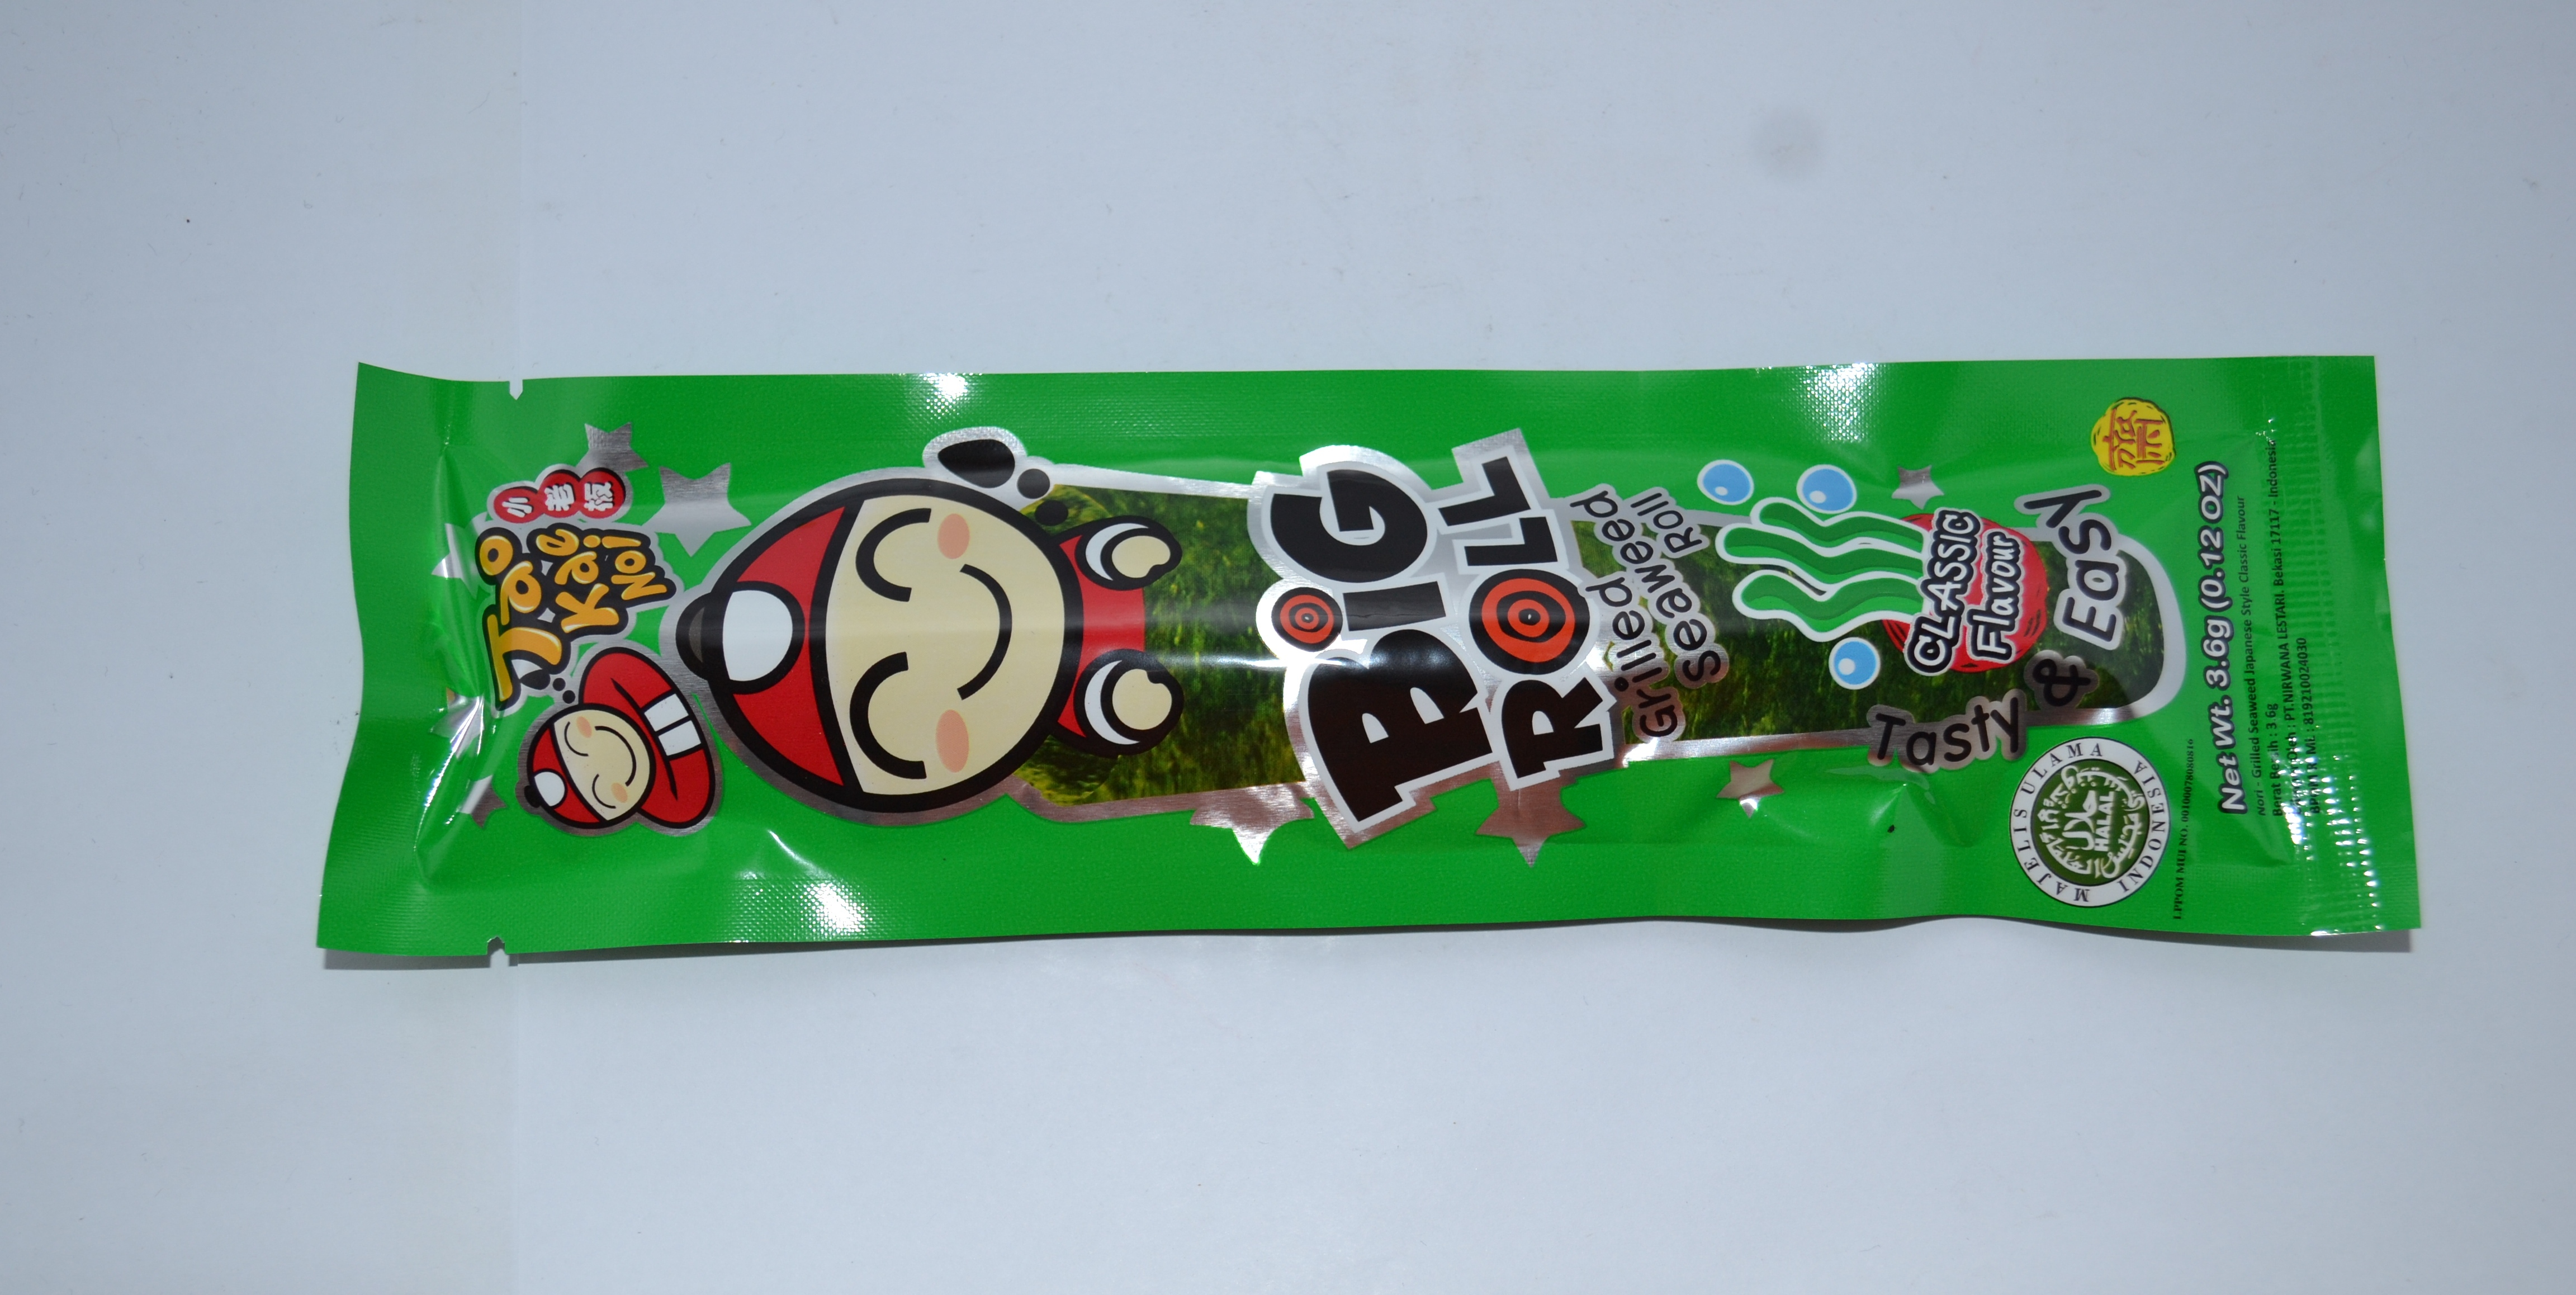 Biscuits Pastries Oishi Rin Bee Stik Rasa Keju Only